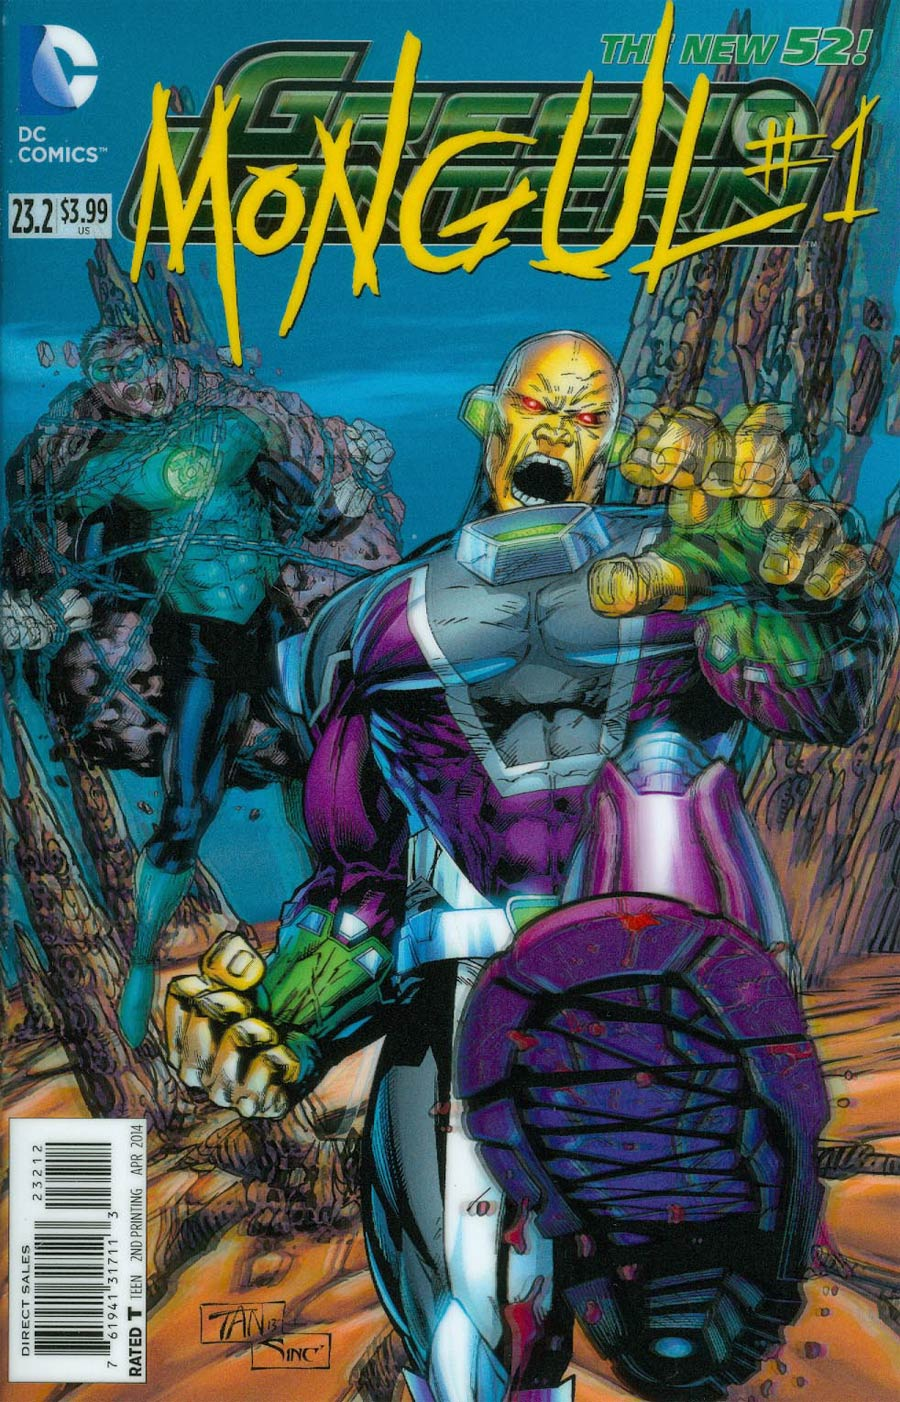 Green Lantern Vol 5 #23.2 Mongul Cover C 2nd Ptg 3D Motion Cover